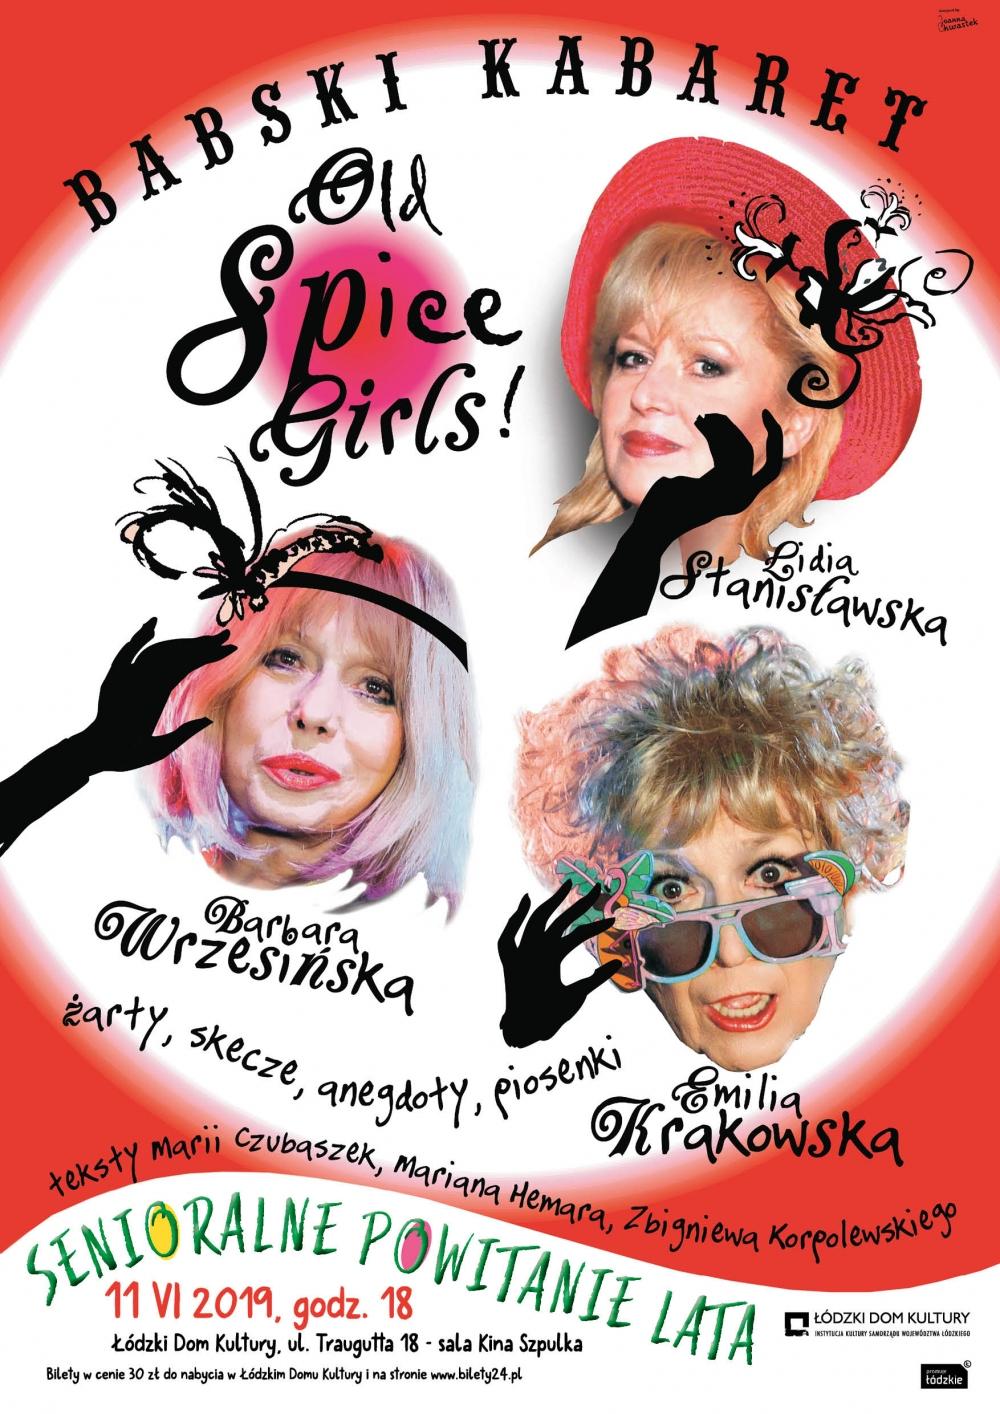 Kabaret - OLD SPICE GIRLS – BABSKI KABARET czyli SENIORALNE POWITANIE LATA